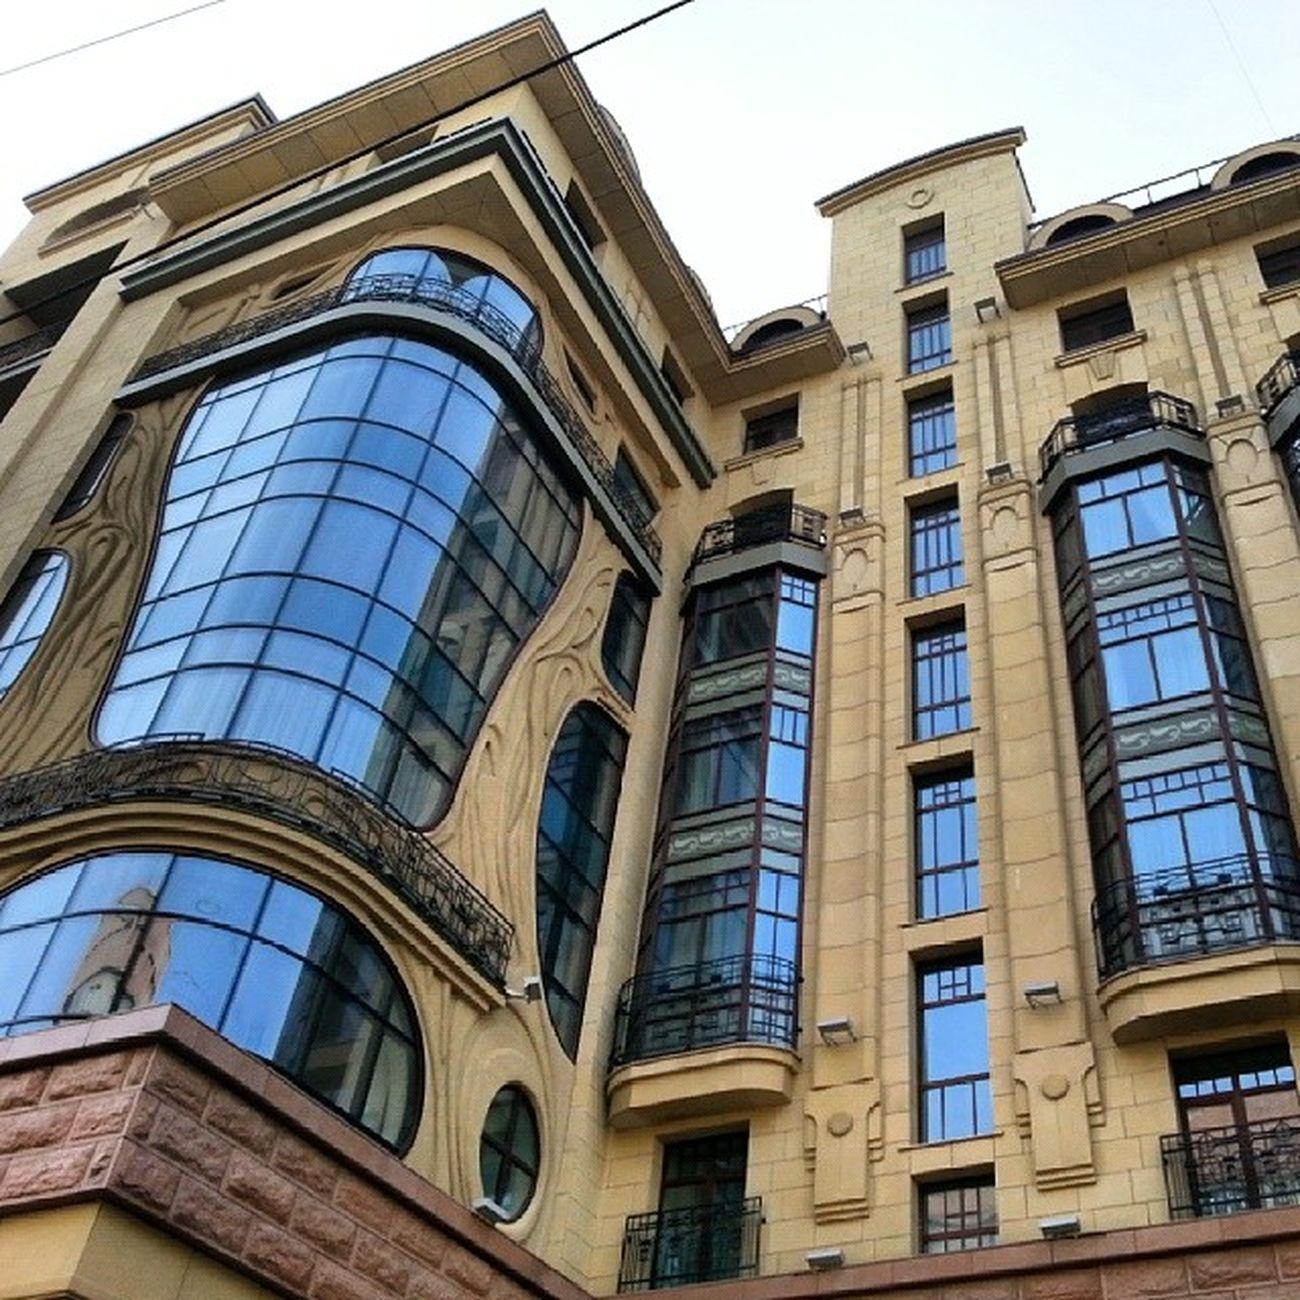 2014 -03-22, Новосибирск , улицаМичурина . гостиница Marriott. Окна/ Novosibirsk. Hotel Marriott. Windows.